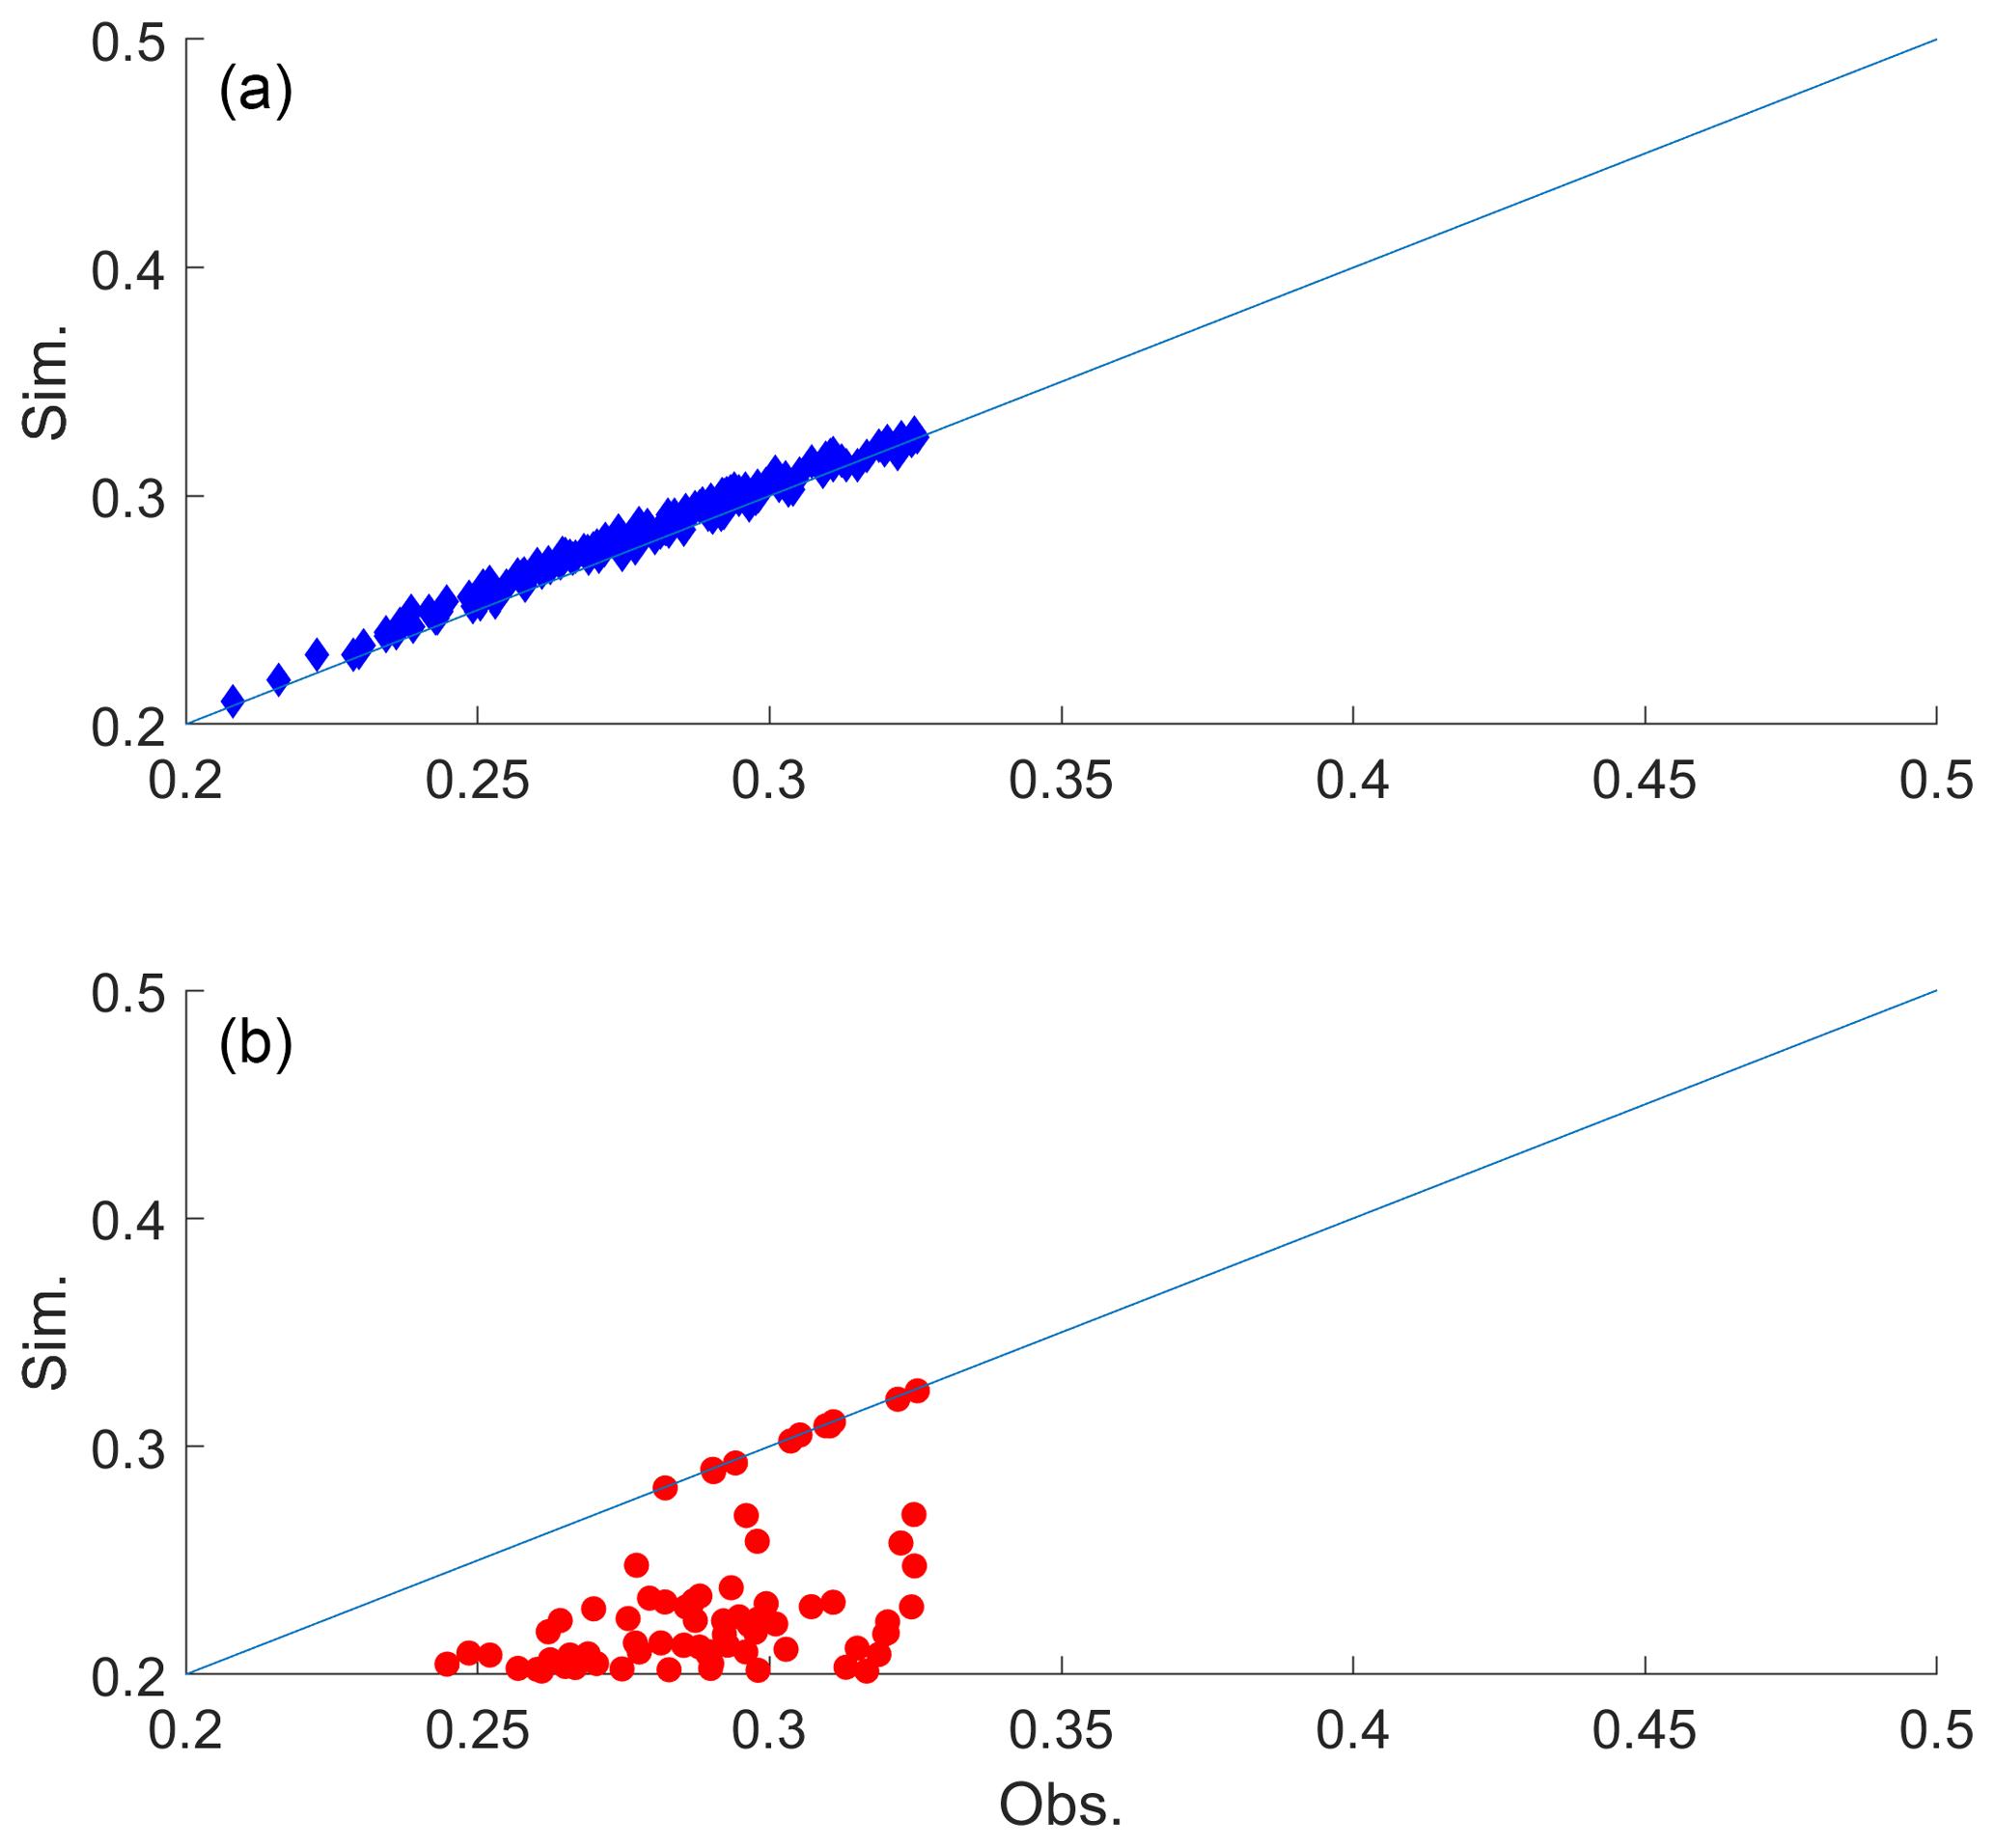 GMD - Discrete k-nearest neighbor resampling for simulating